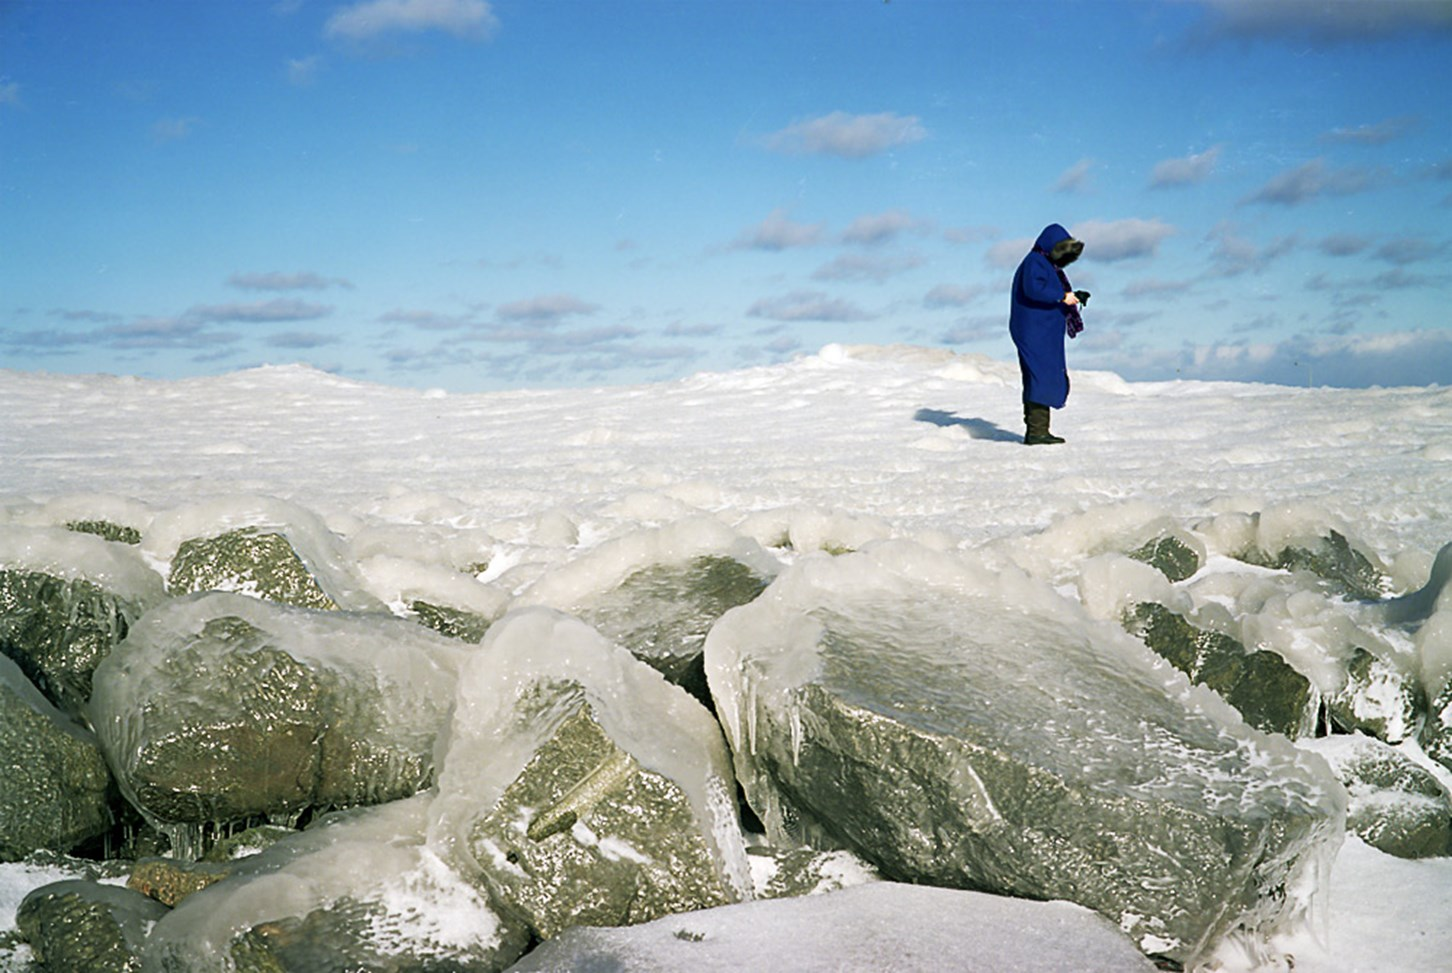 A Woman Walks On Ice, Duluth, Minnesota, March 2011